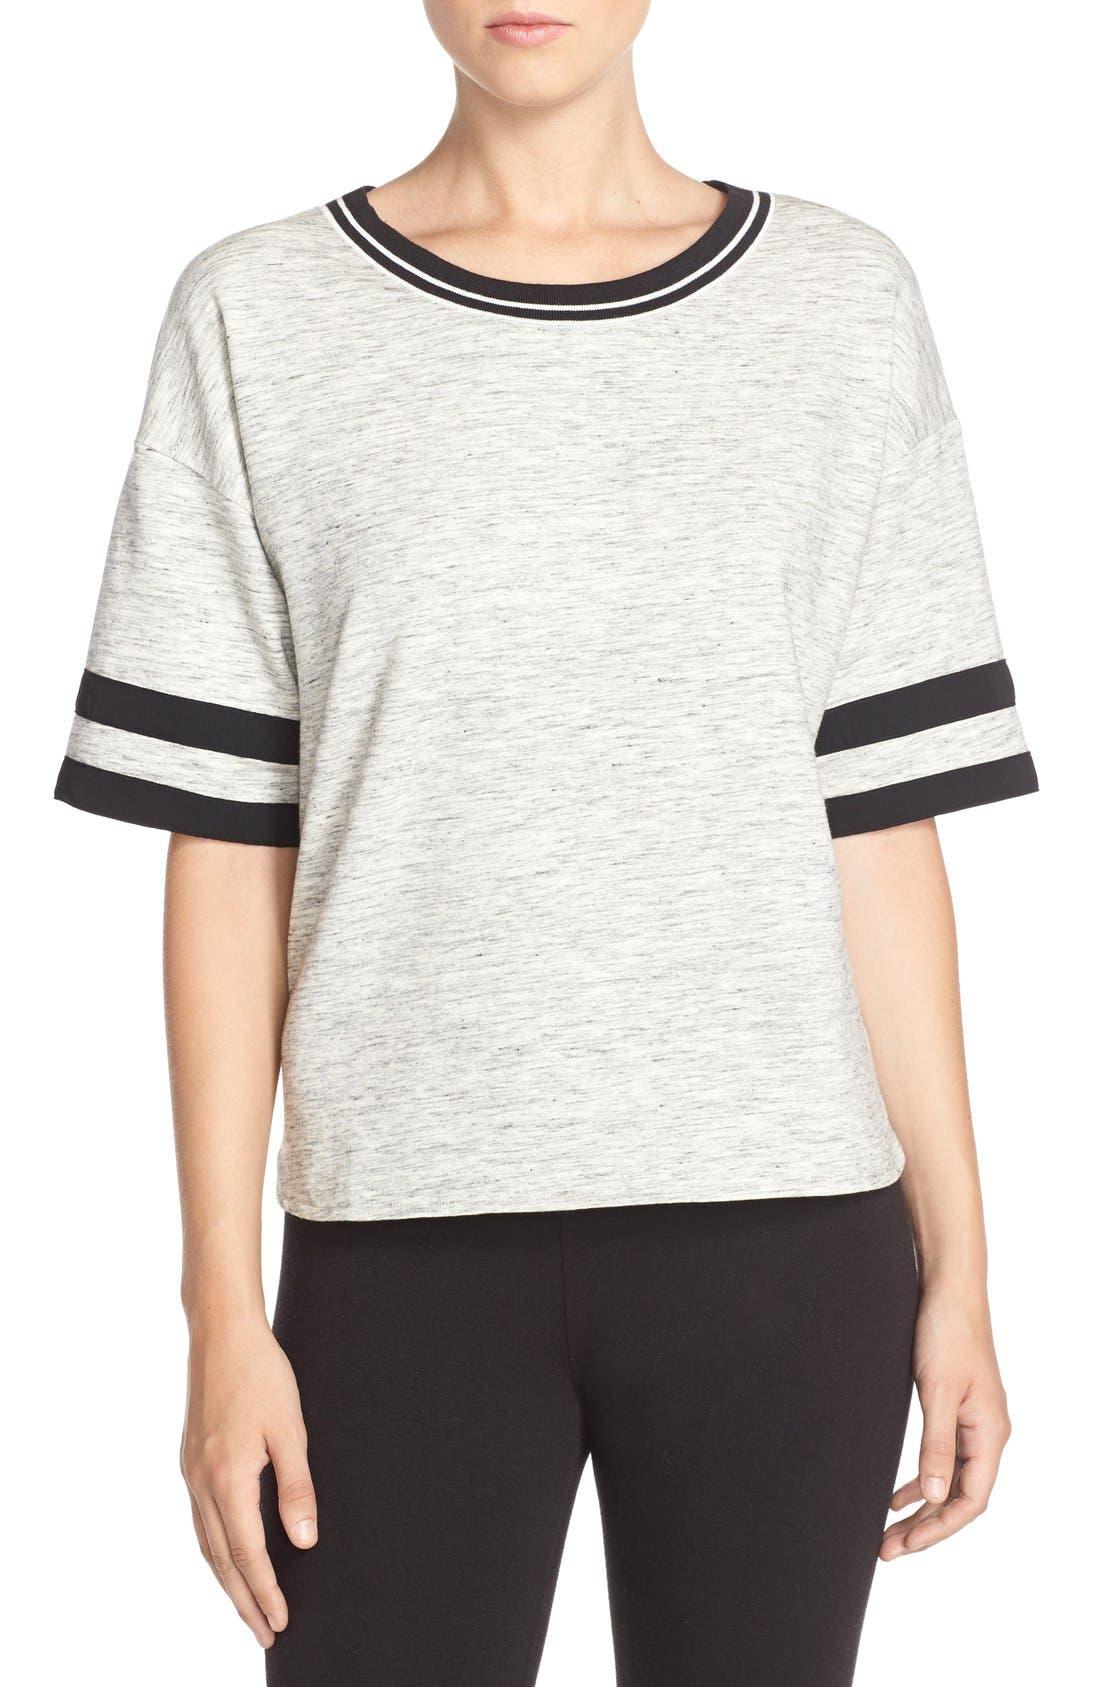 Alternate Image 1 Selected - DKNYShort Sleeve Top